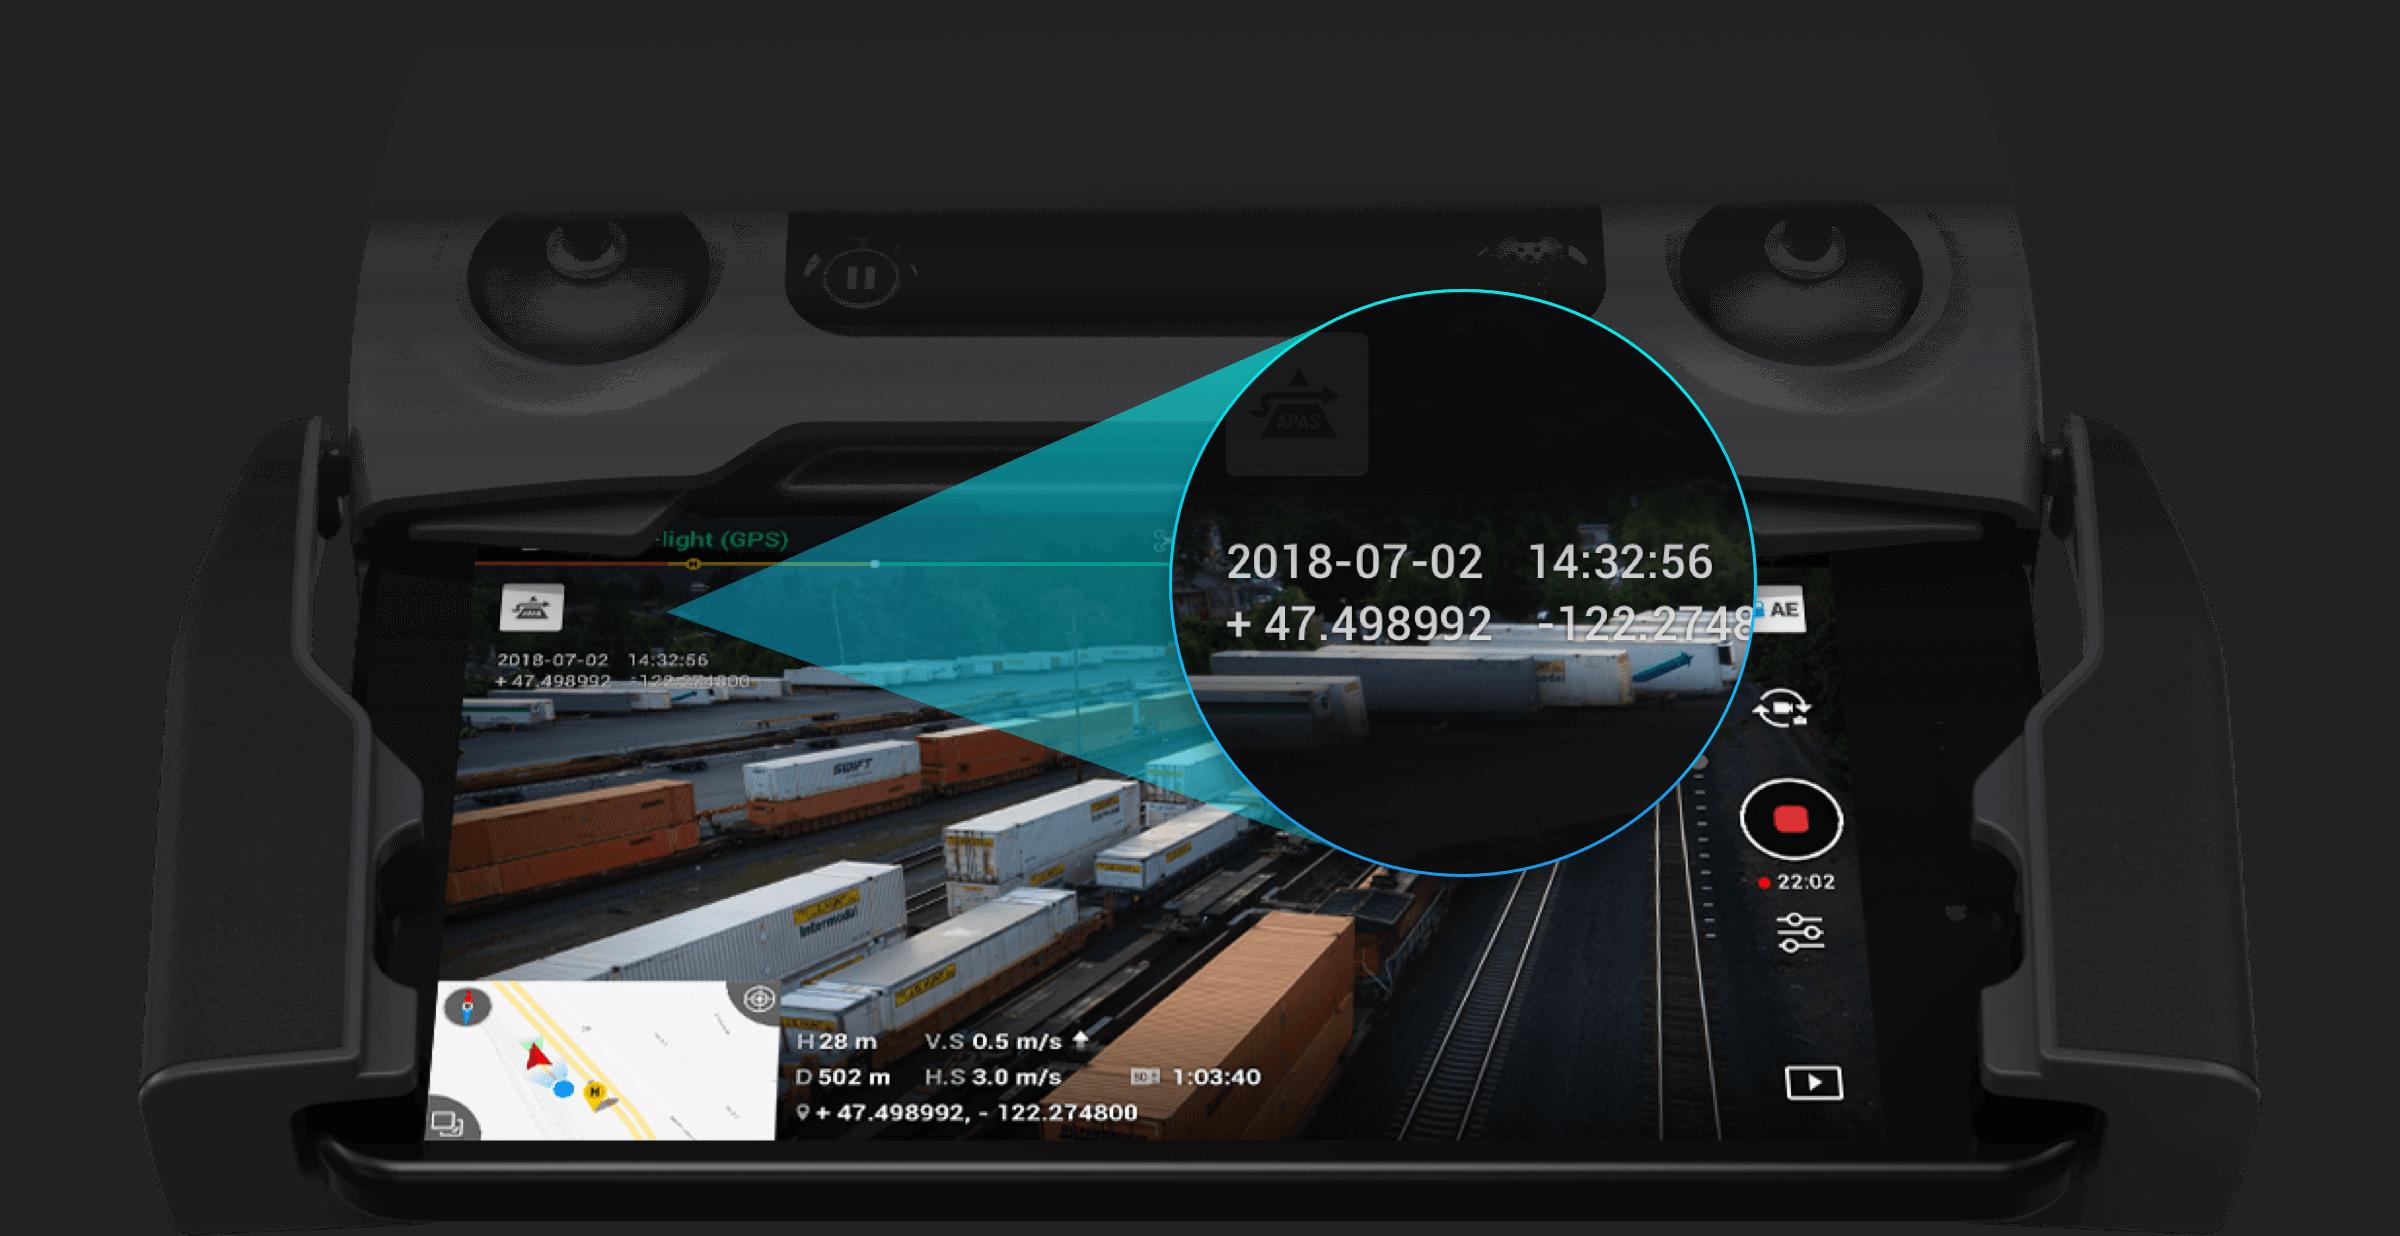 Mavic 2 Enterprise GPS timestamping records